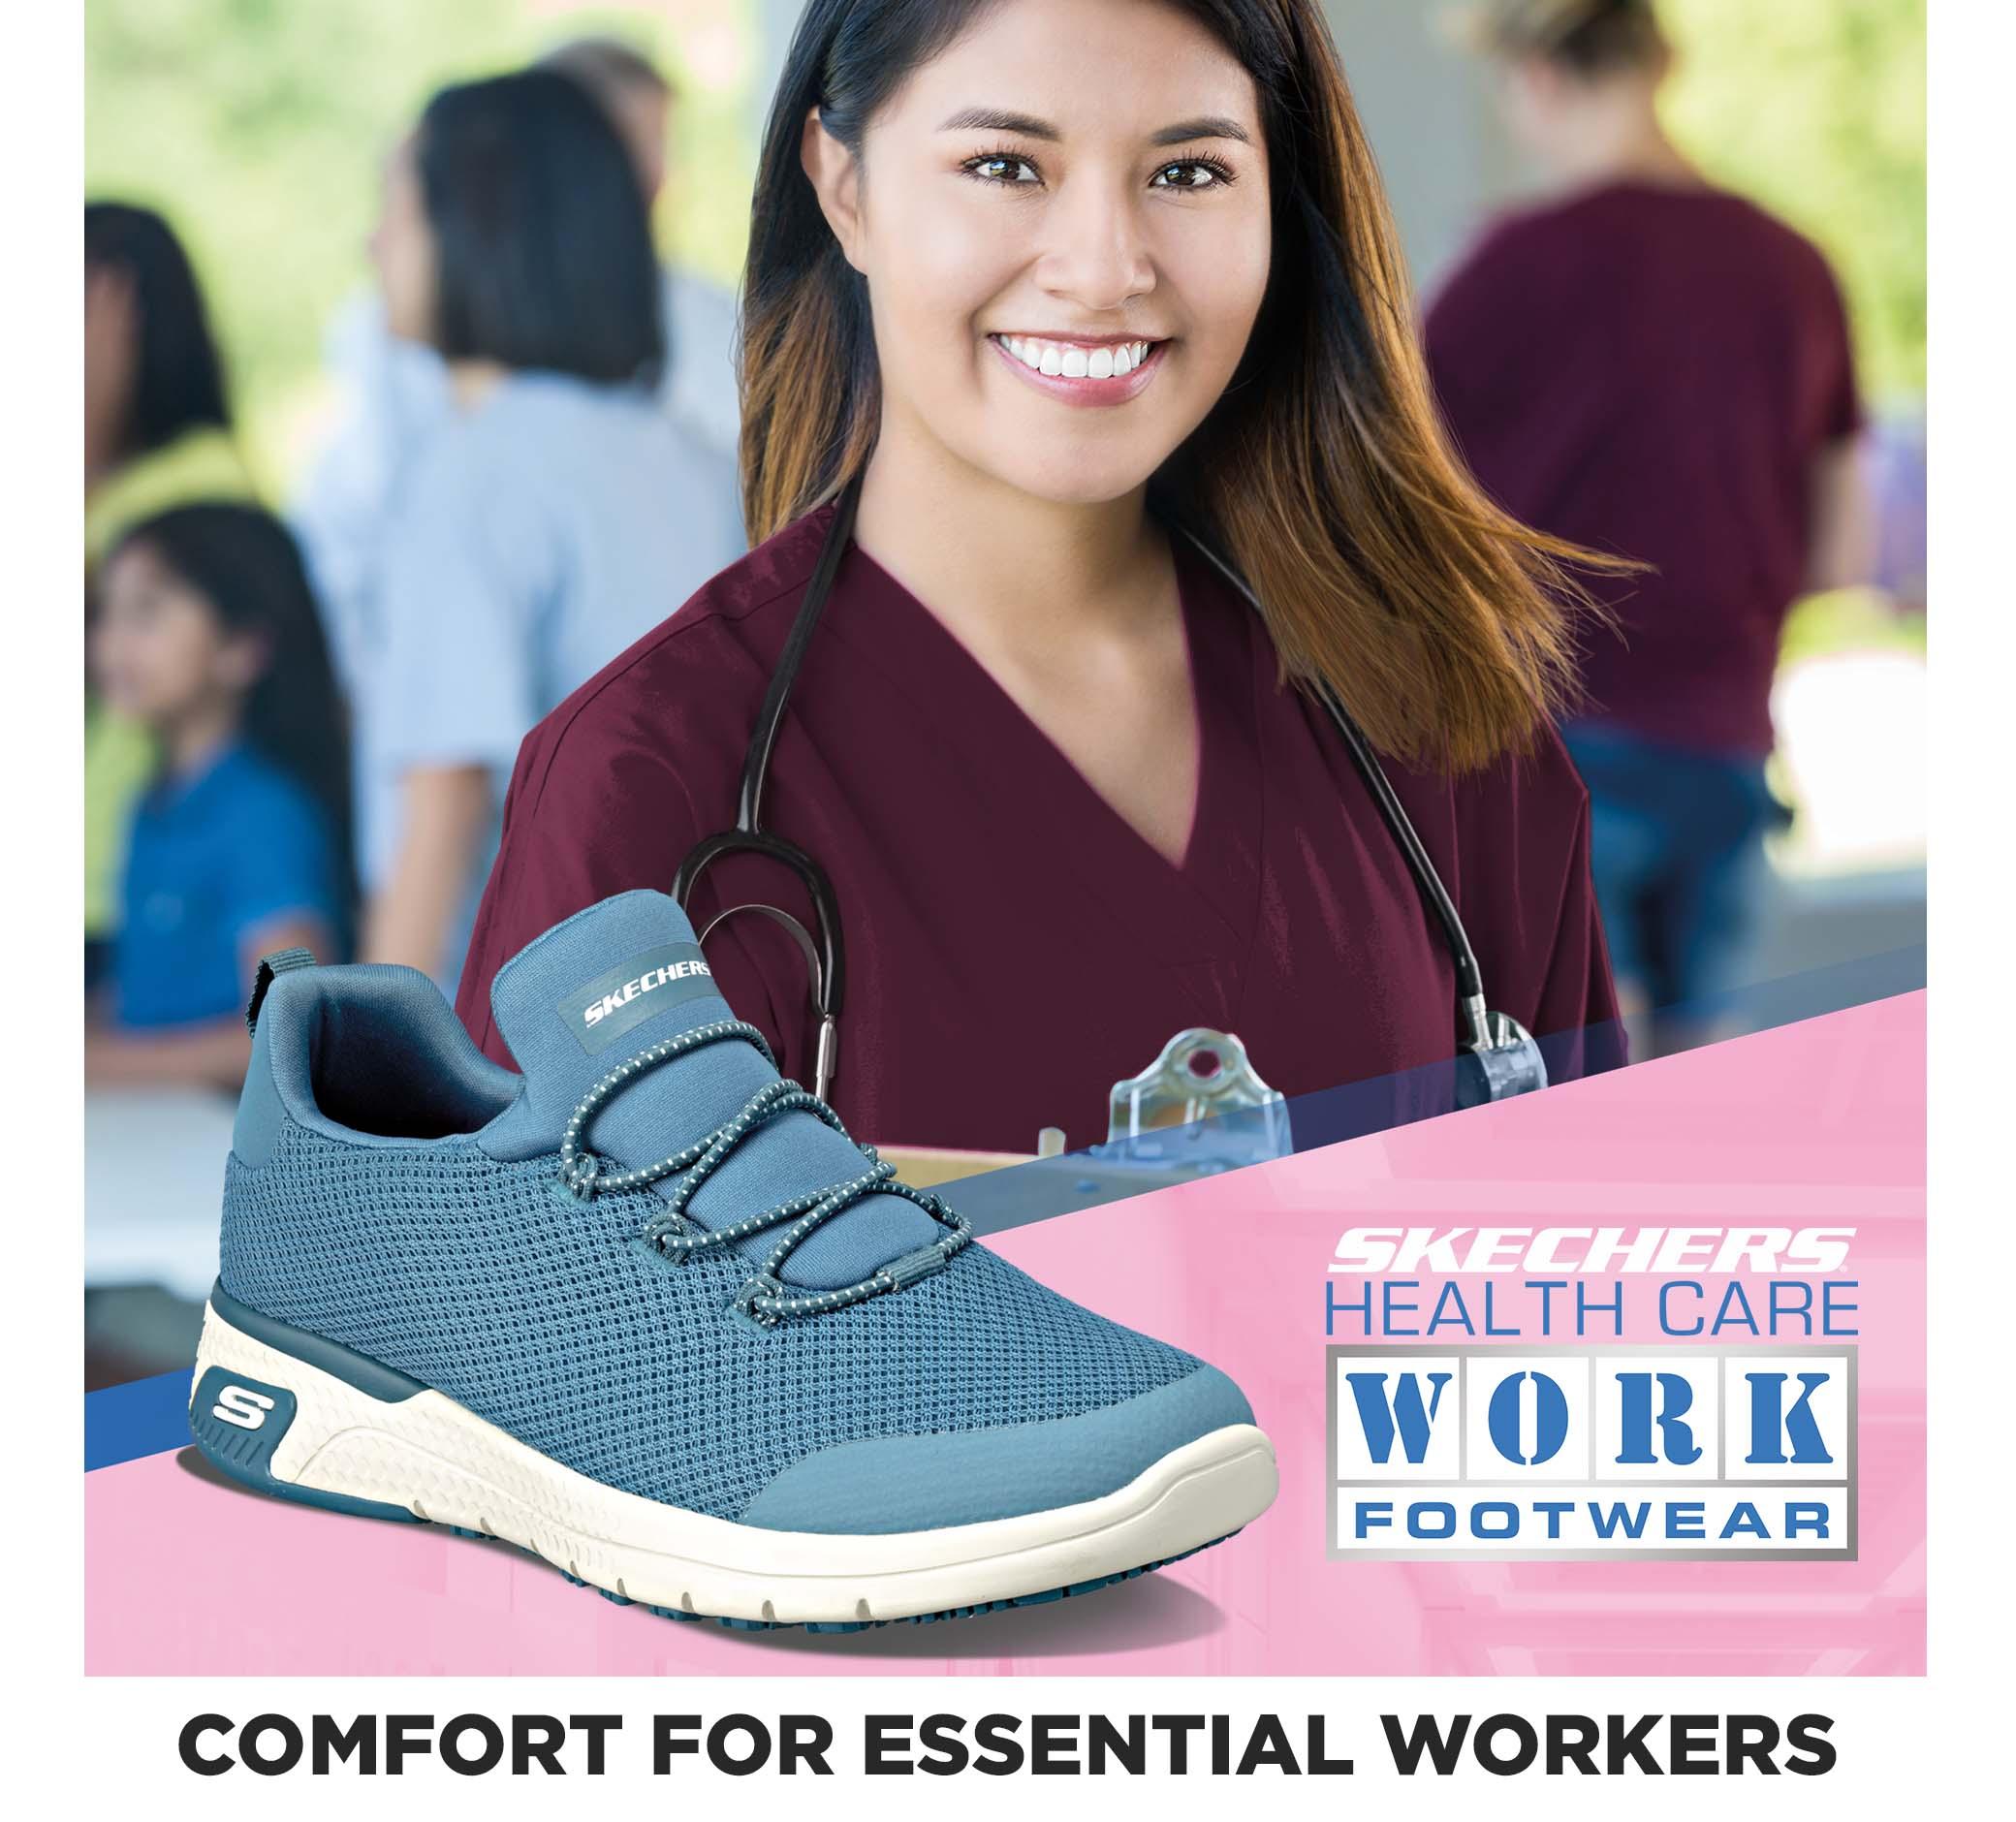 zapatos skechers 2018 new westminster guadalajara jalisco